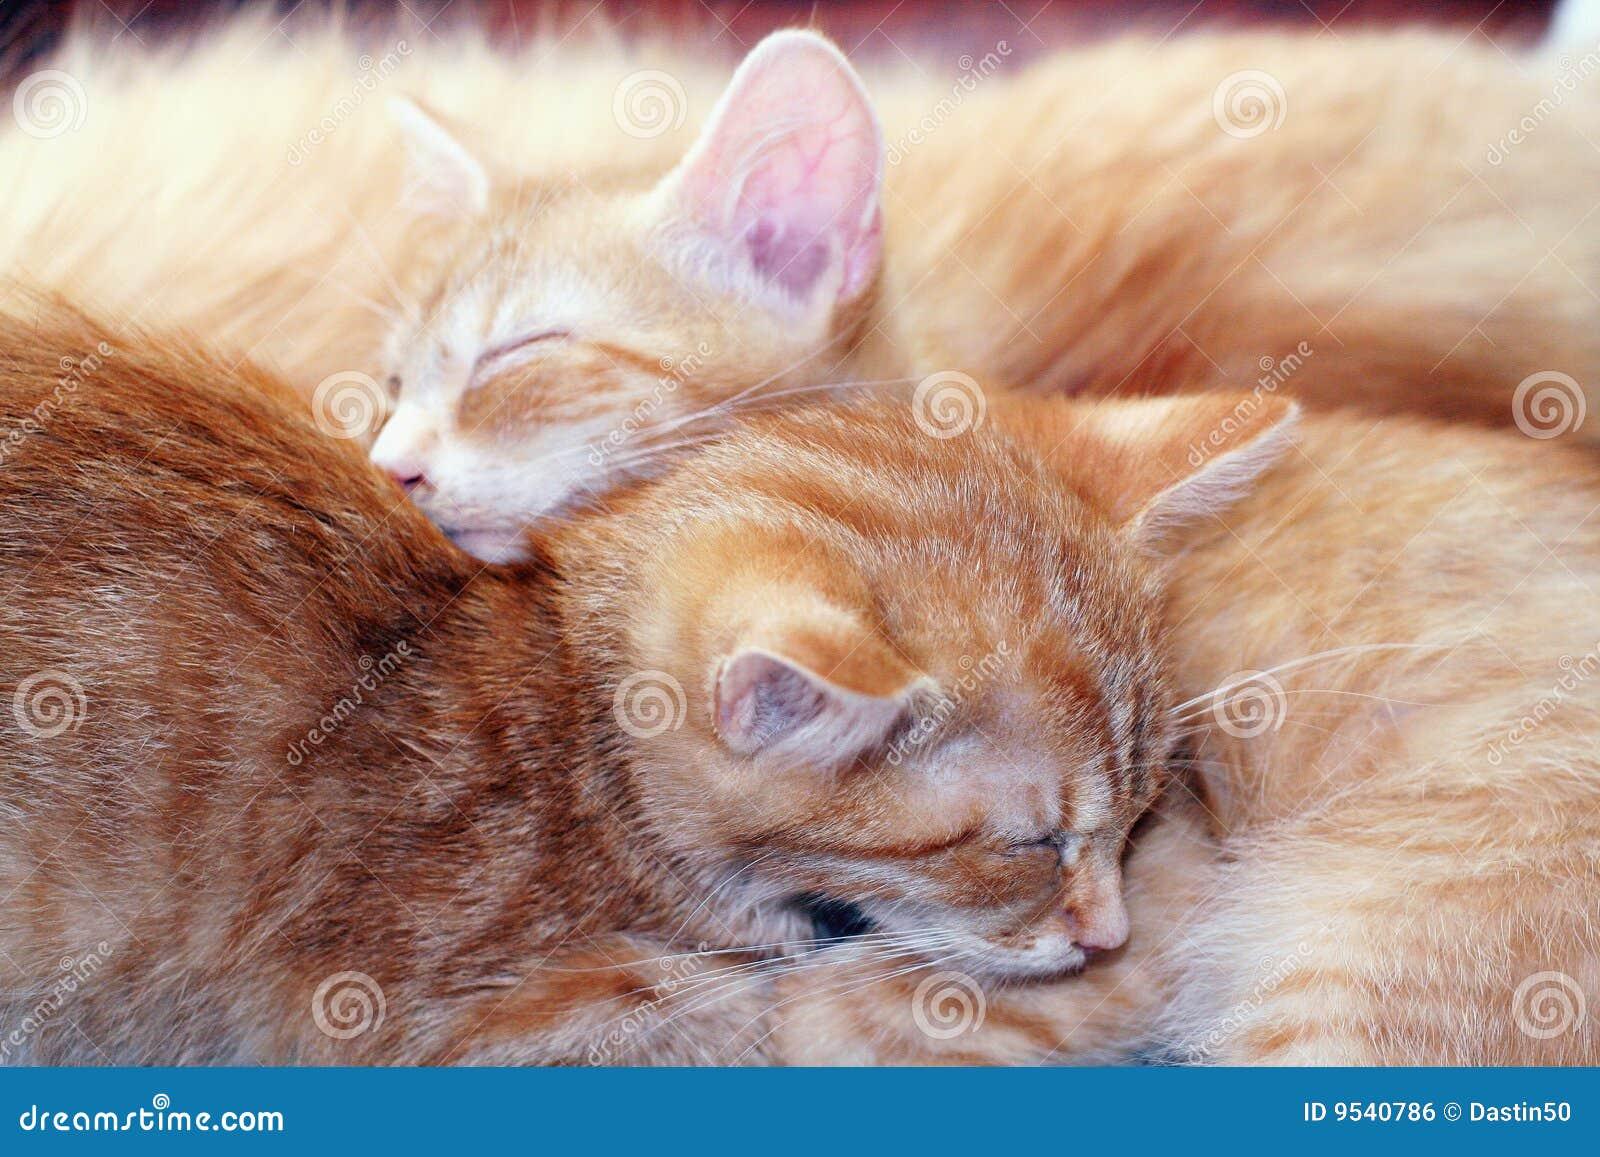 gatos bonitos related keywords - photo #3